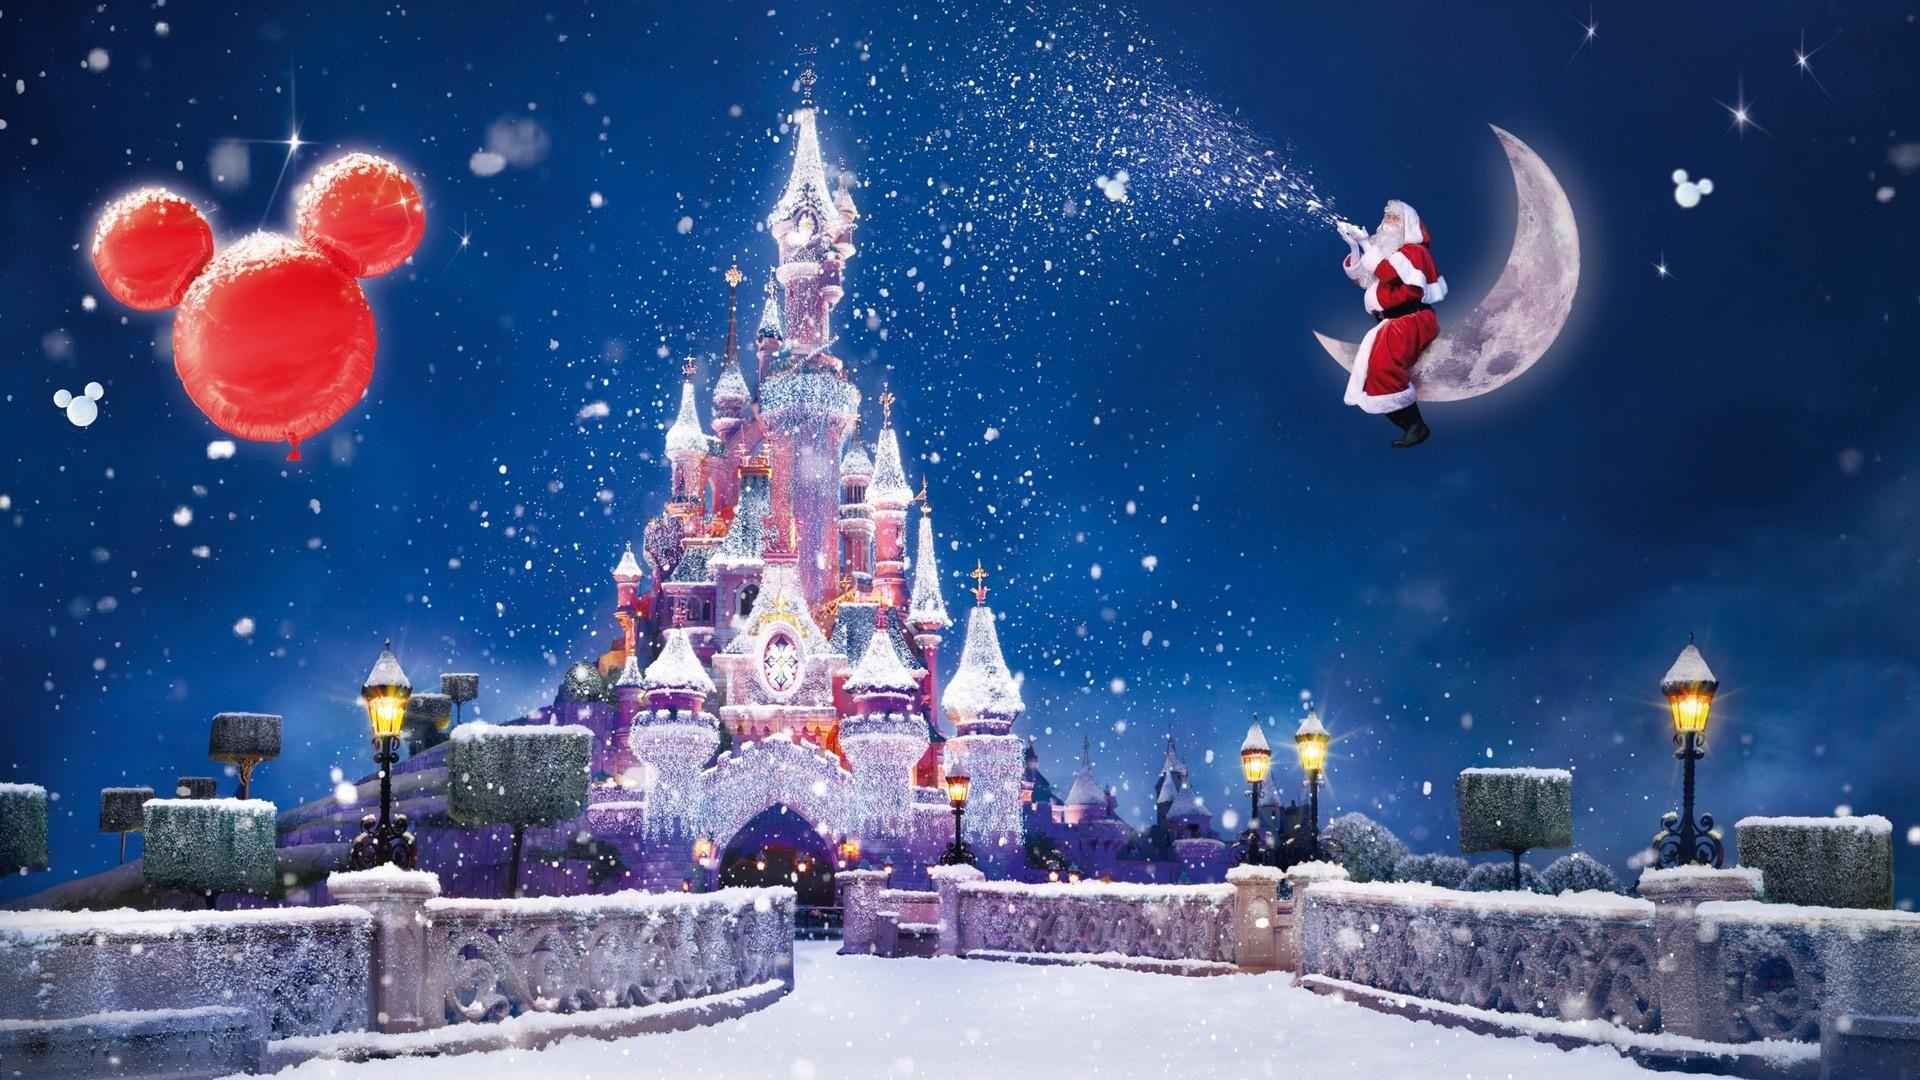 Xmas Stuff For > Hd Christmas Wallpaper Widescreen